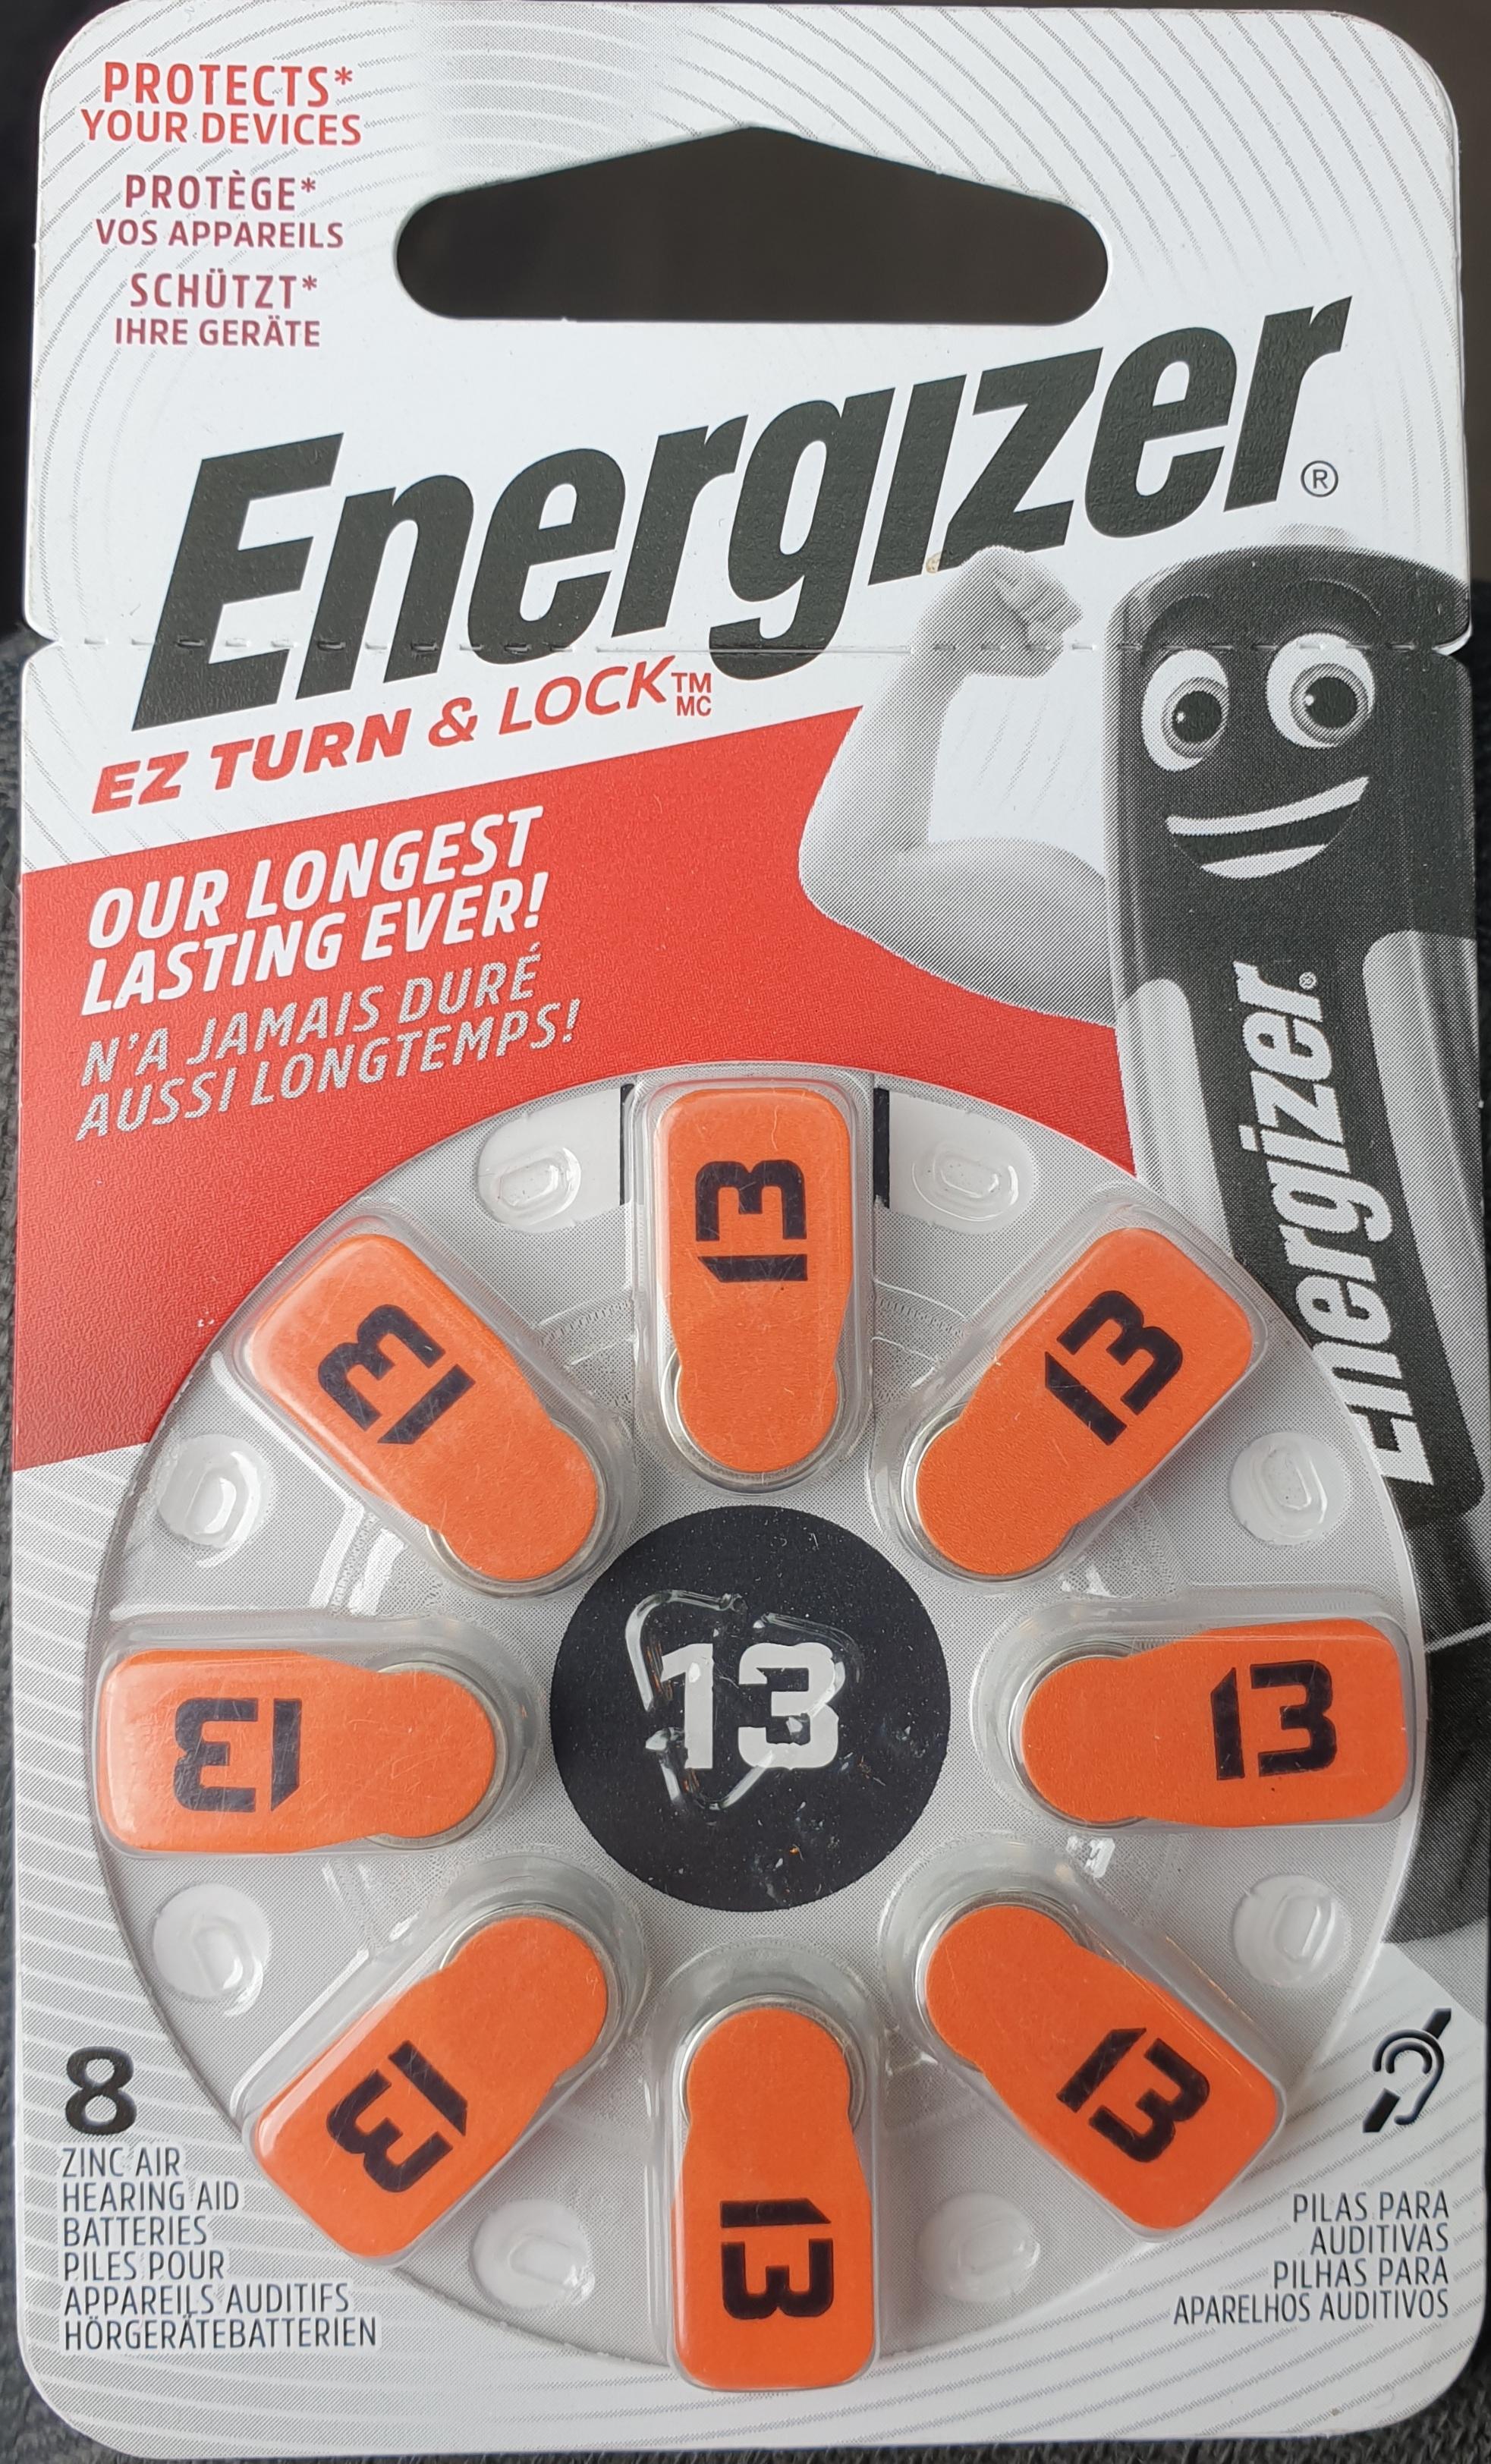 [ Thomas Philipps ] *Lokal* Energizer 13 im 8er Blister 1€ / andere Größen * Raus damit *